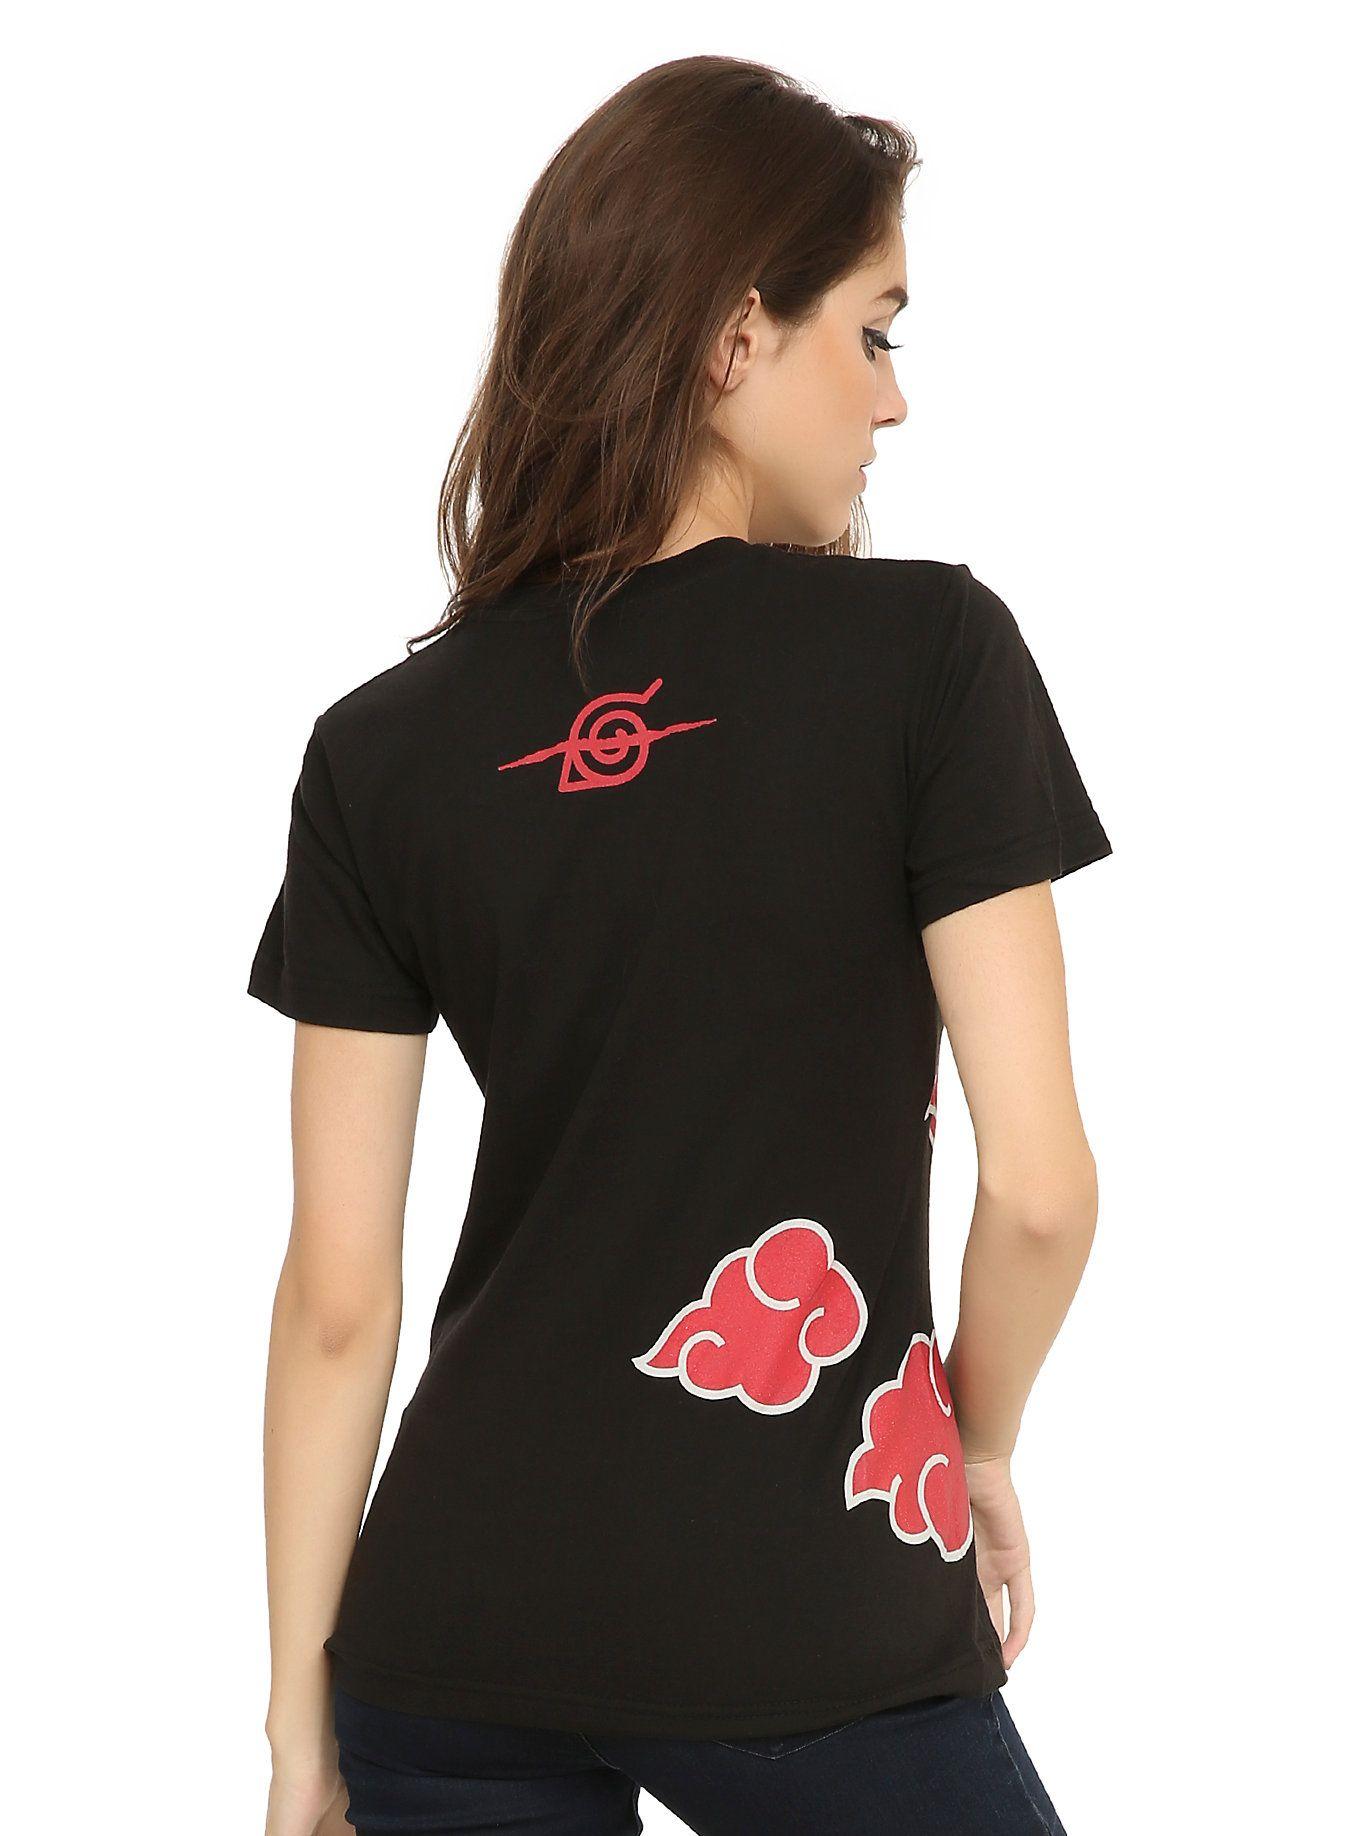 abd08340c Naruto Shippuden Itachi Clouds Girls T-Shirt | Hot Topic | Graphic ...